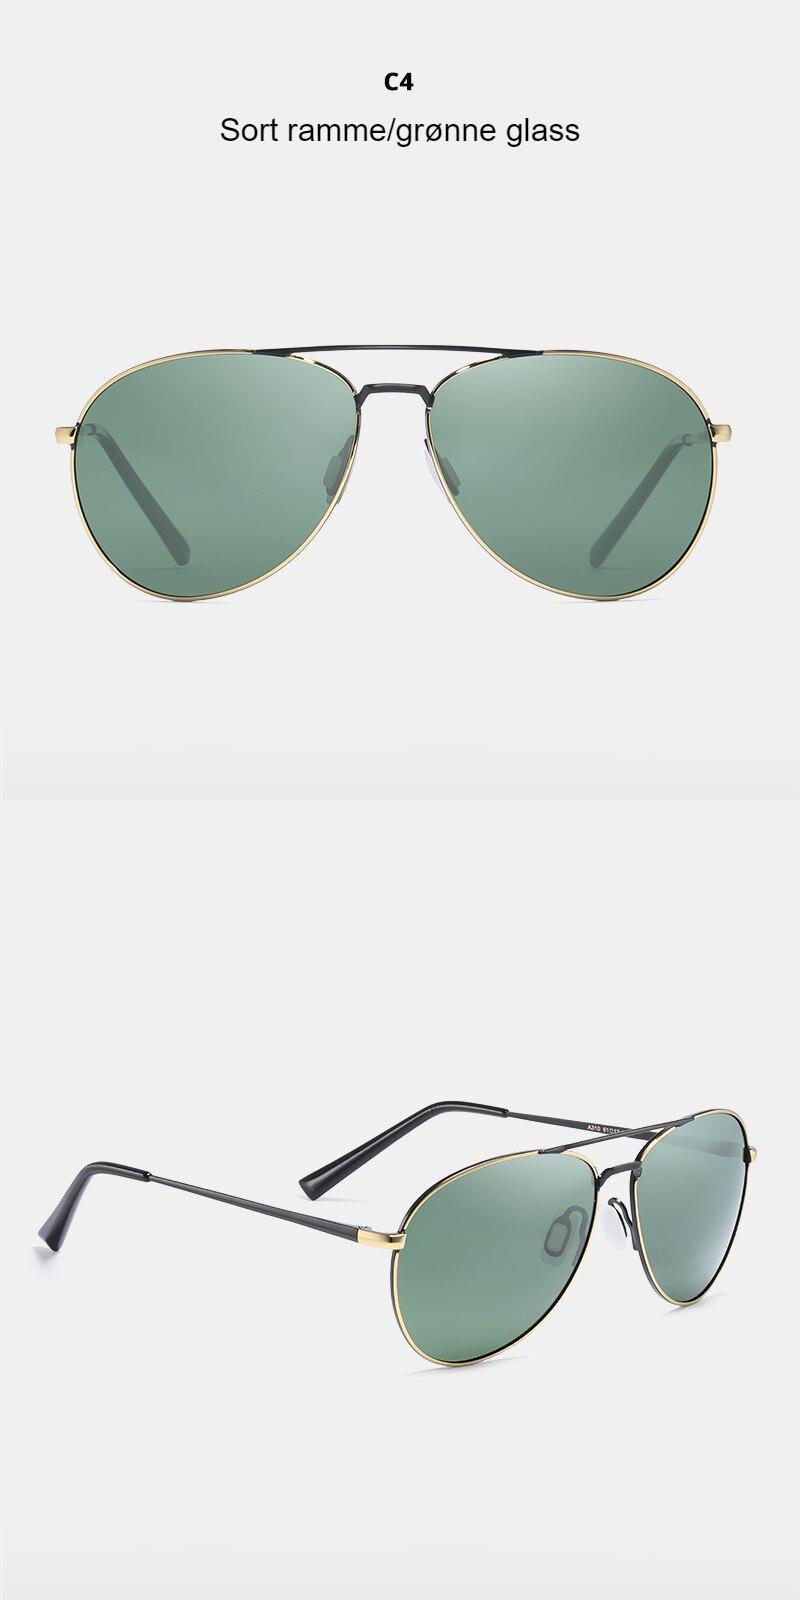 KDEAM Couple Pilot Sunglasses Polarized Men Twin Bridge Driving Men's Sun Glasses With Anti-Skid Silicone Nose Pad